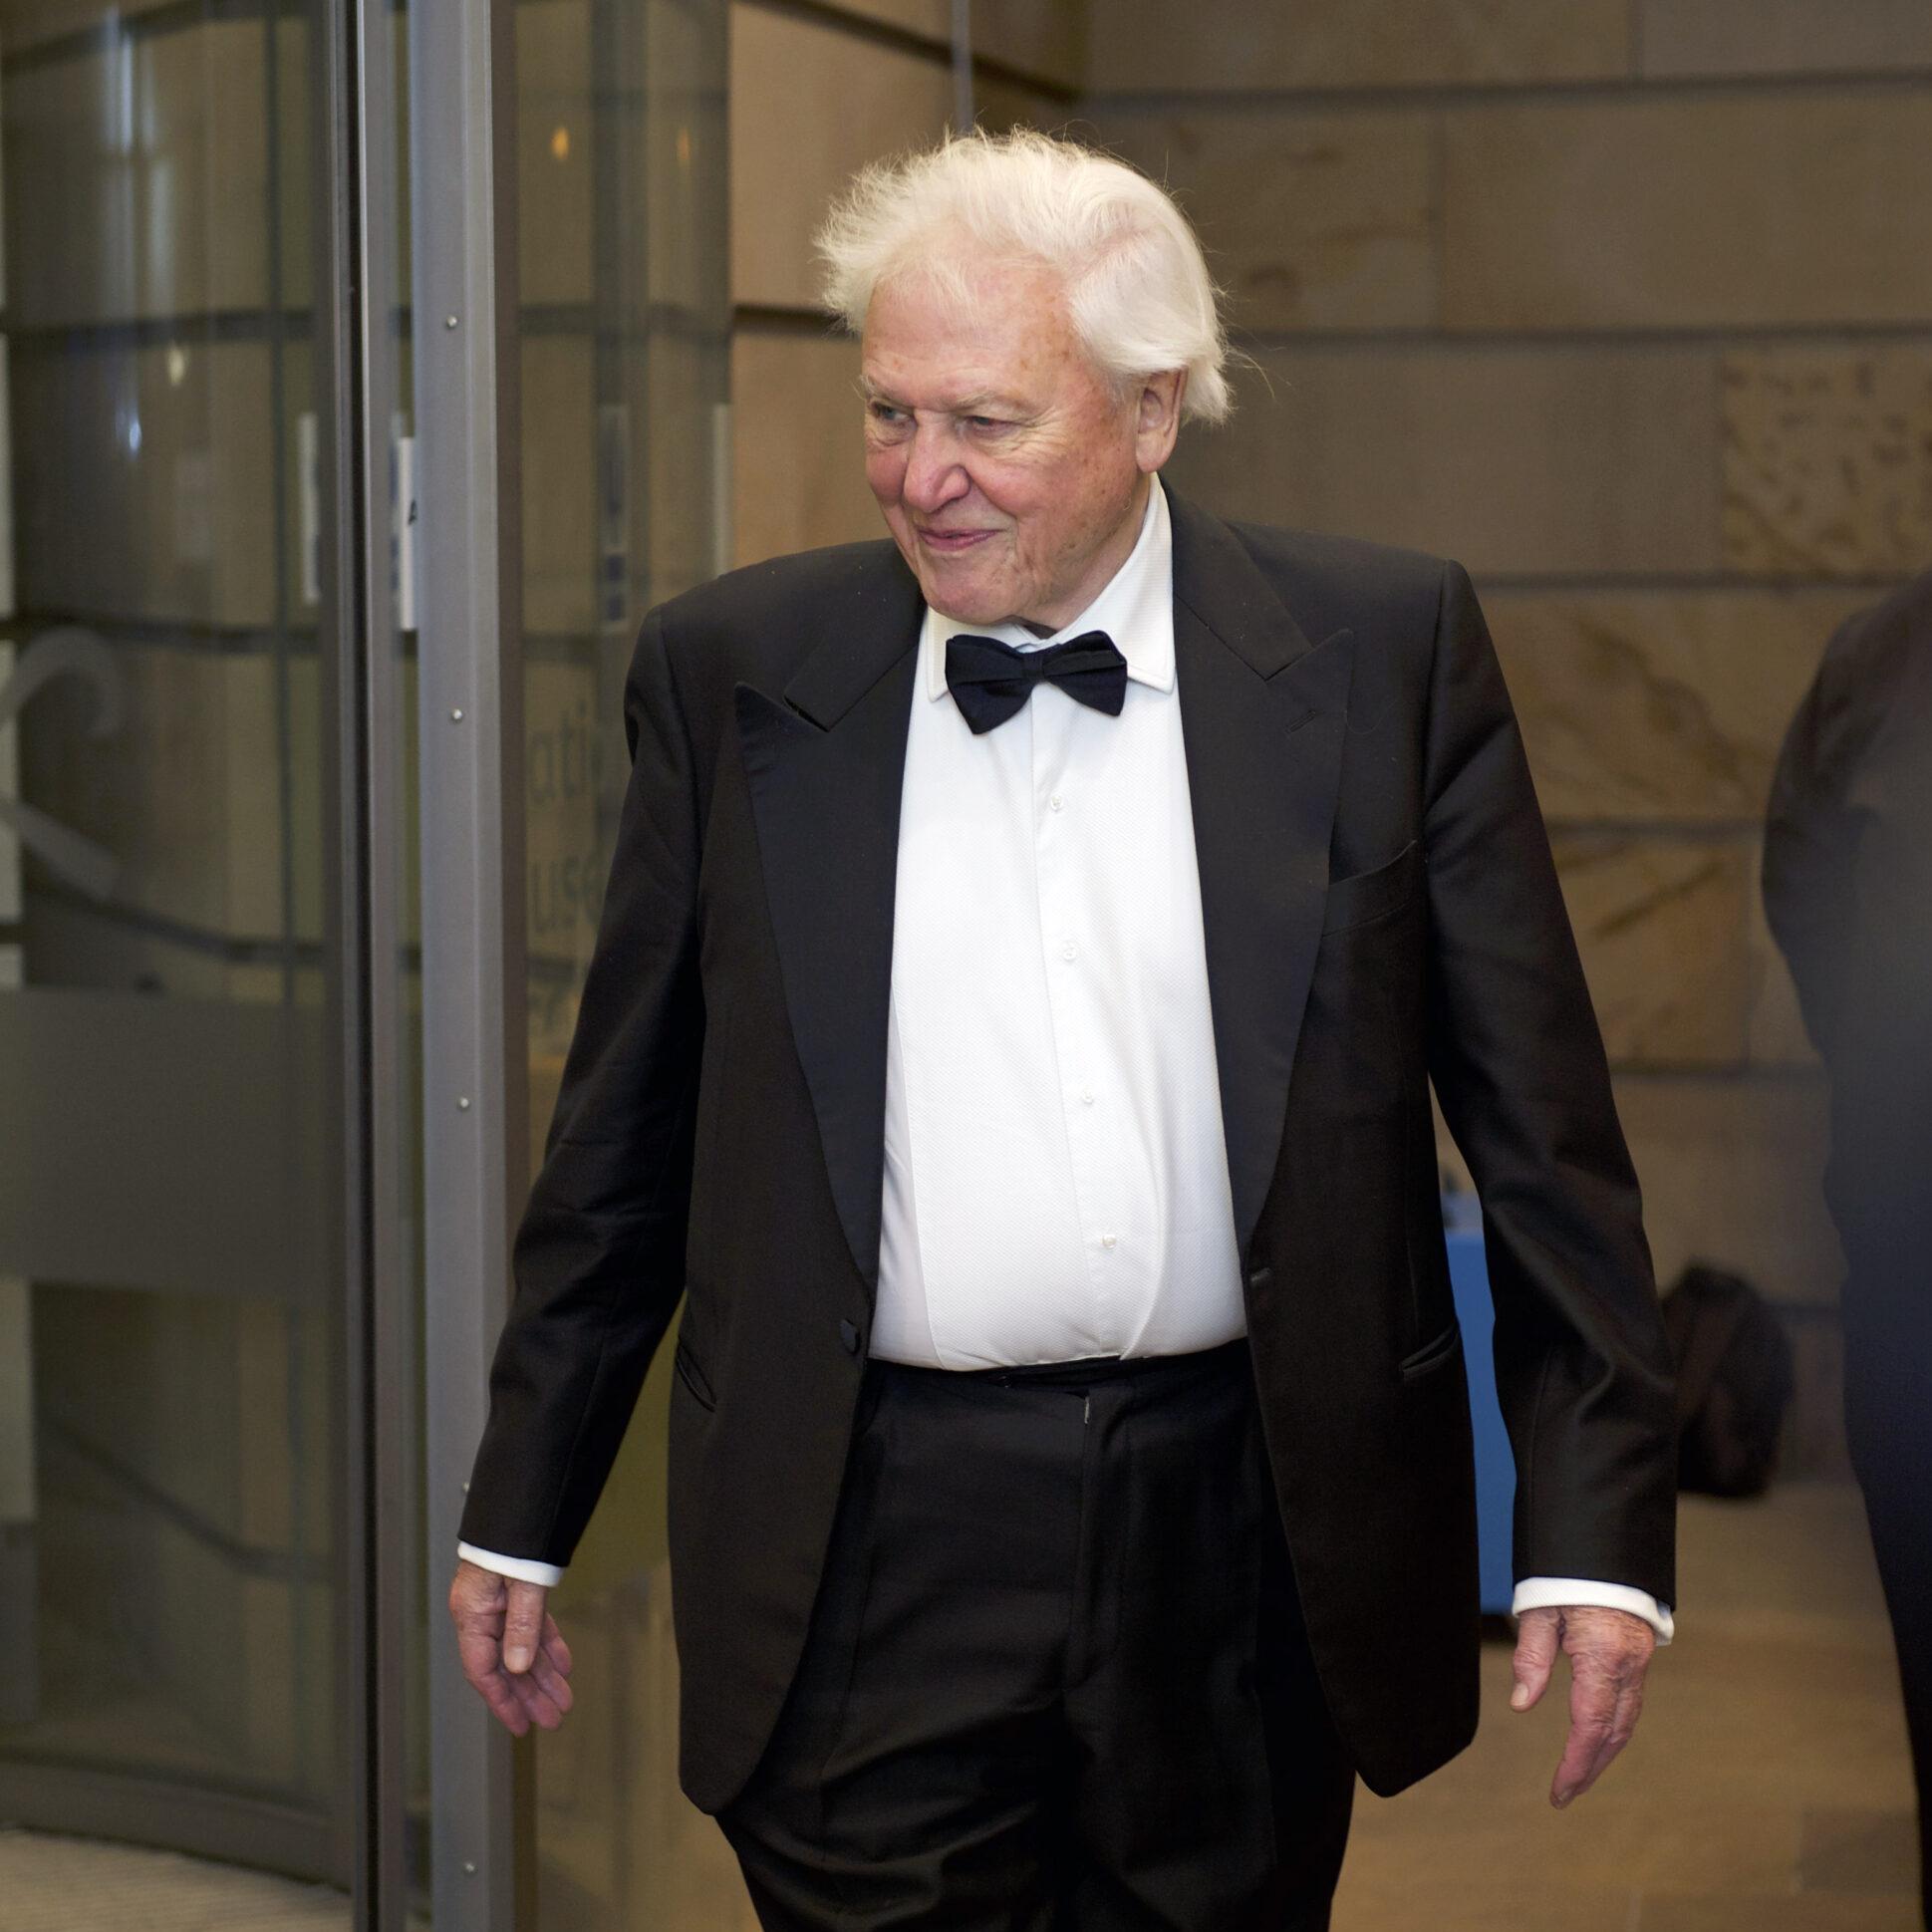 Sir David Attenborough dinner